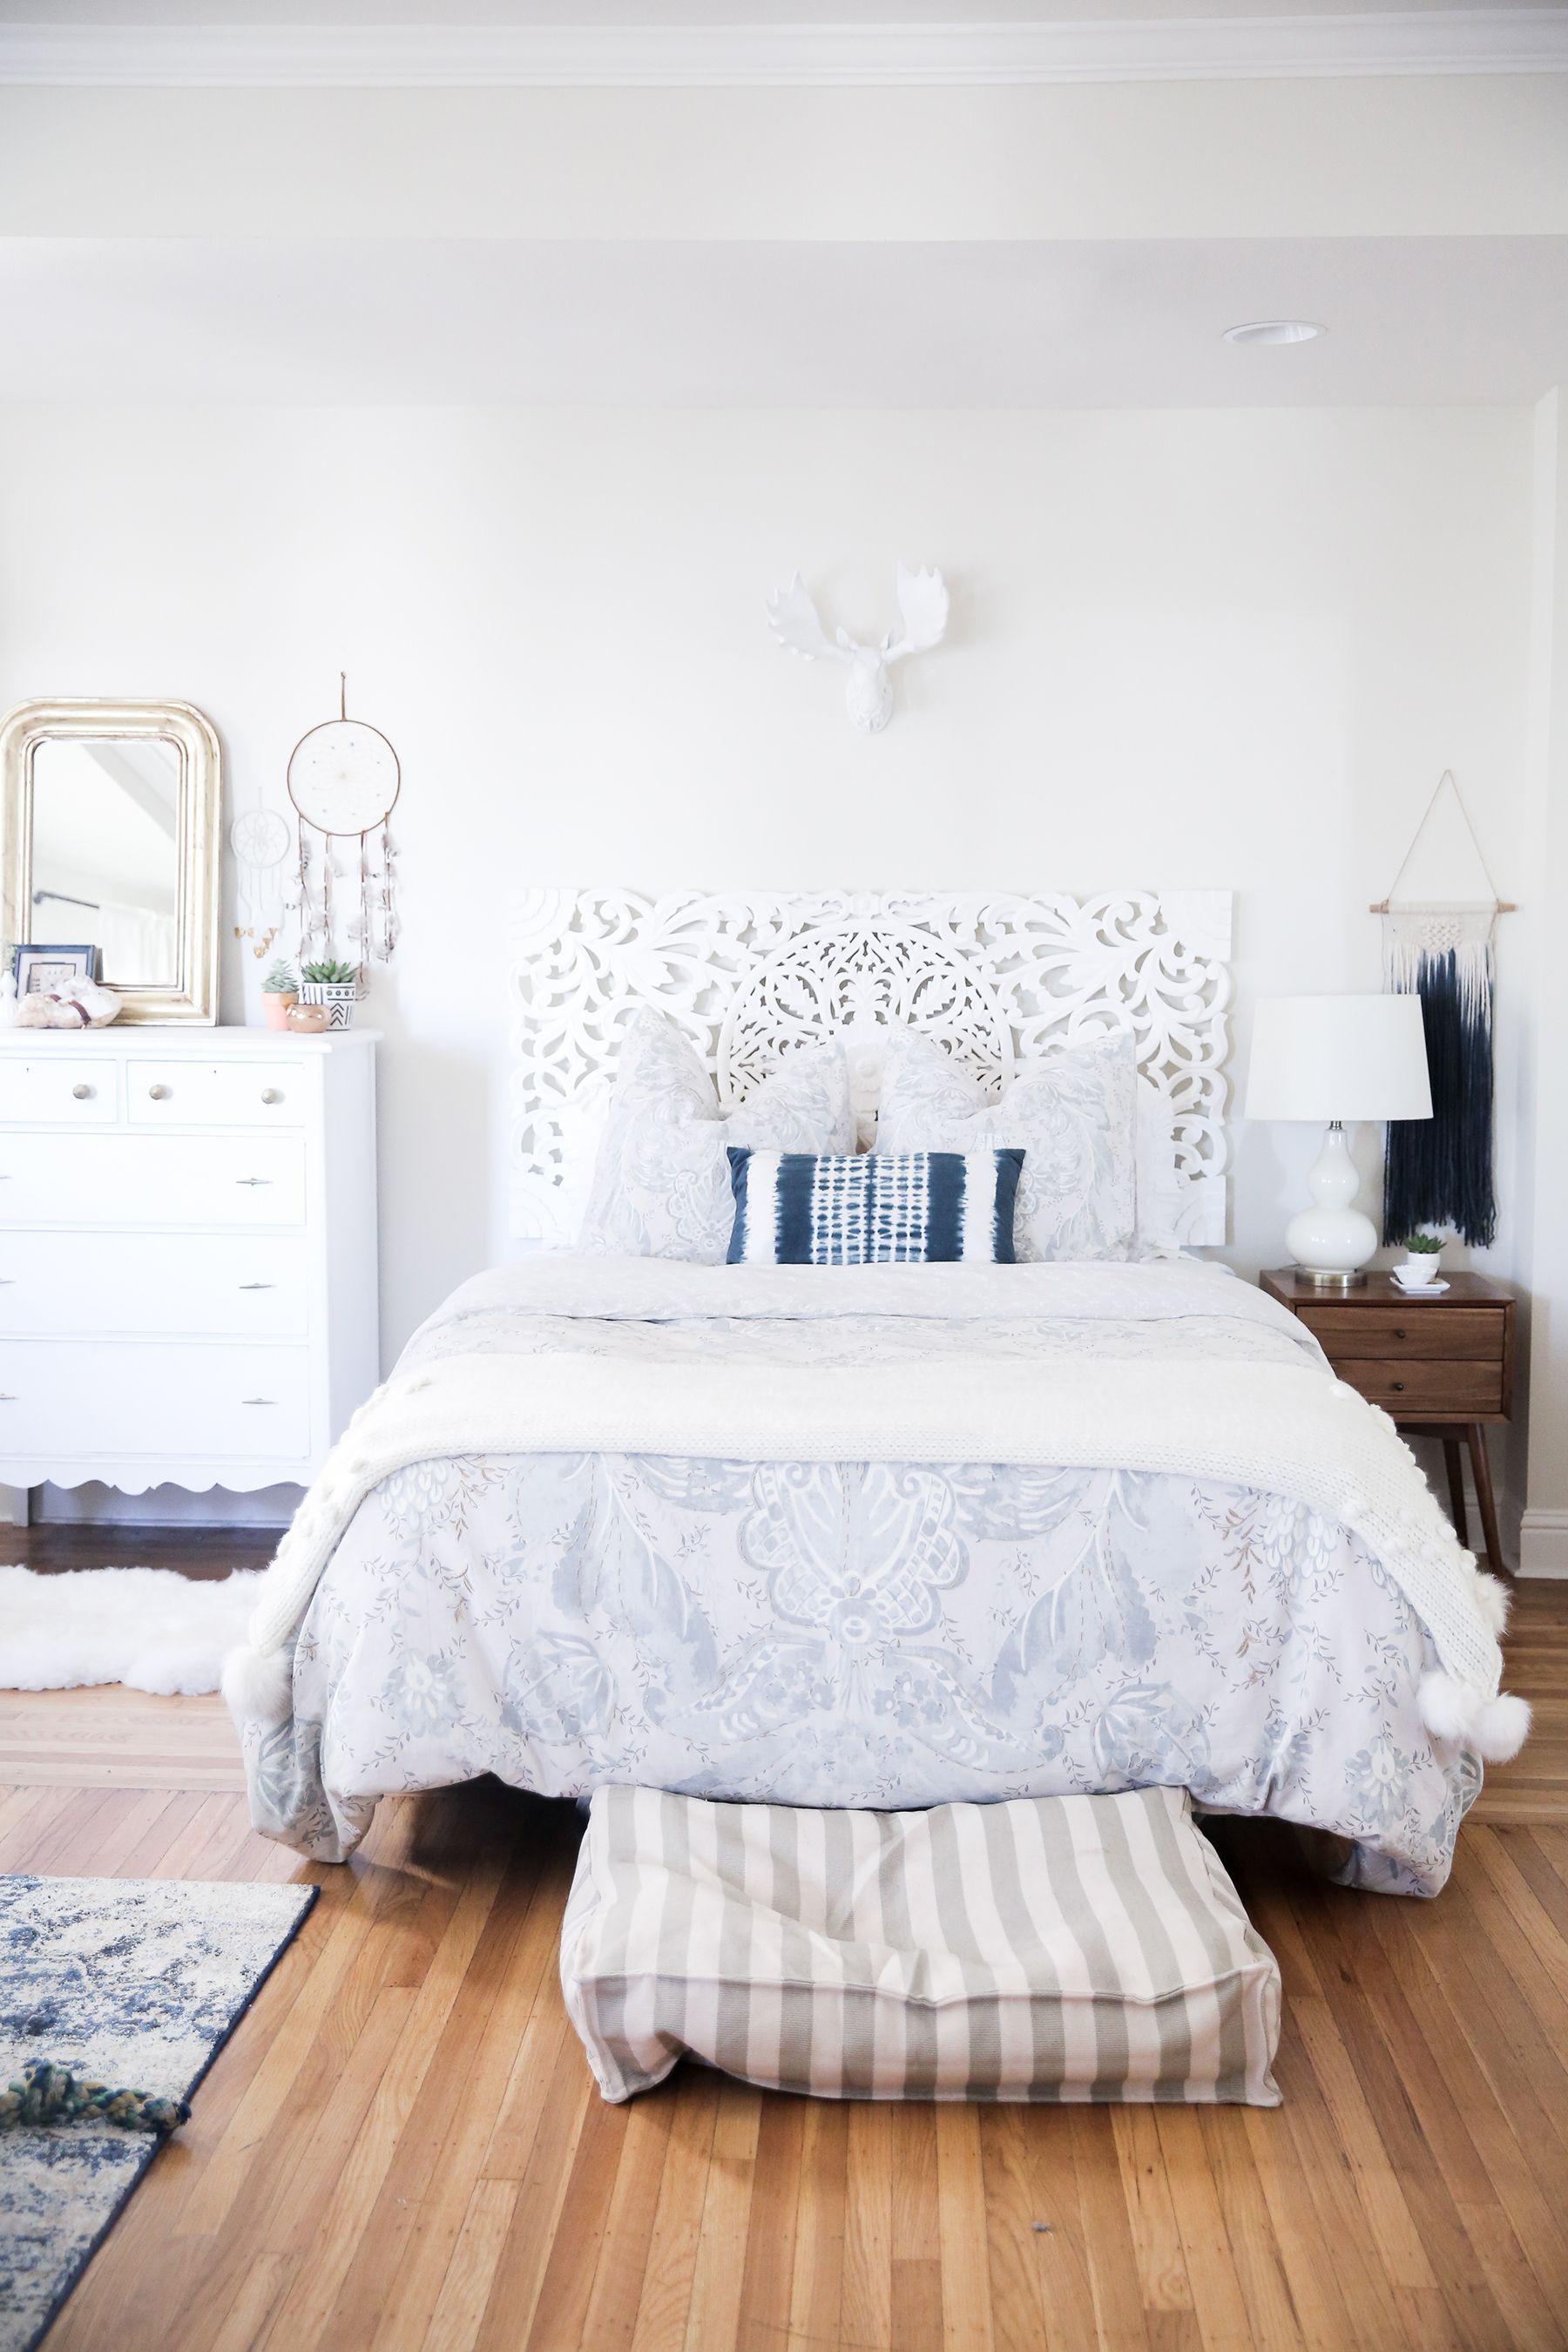 Anthropologie Bedroom: Designing My Dream Bedroom With InteriorCrowd